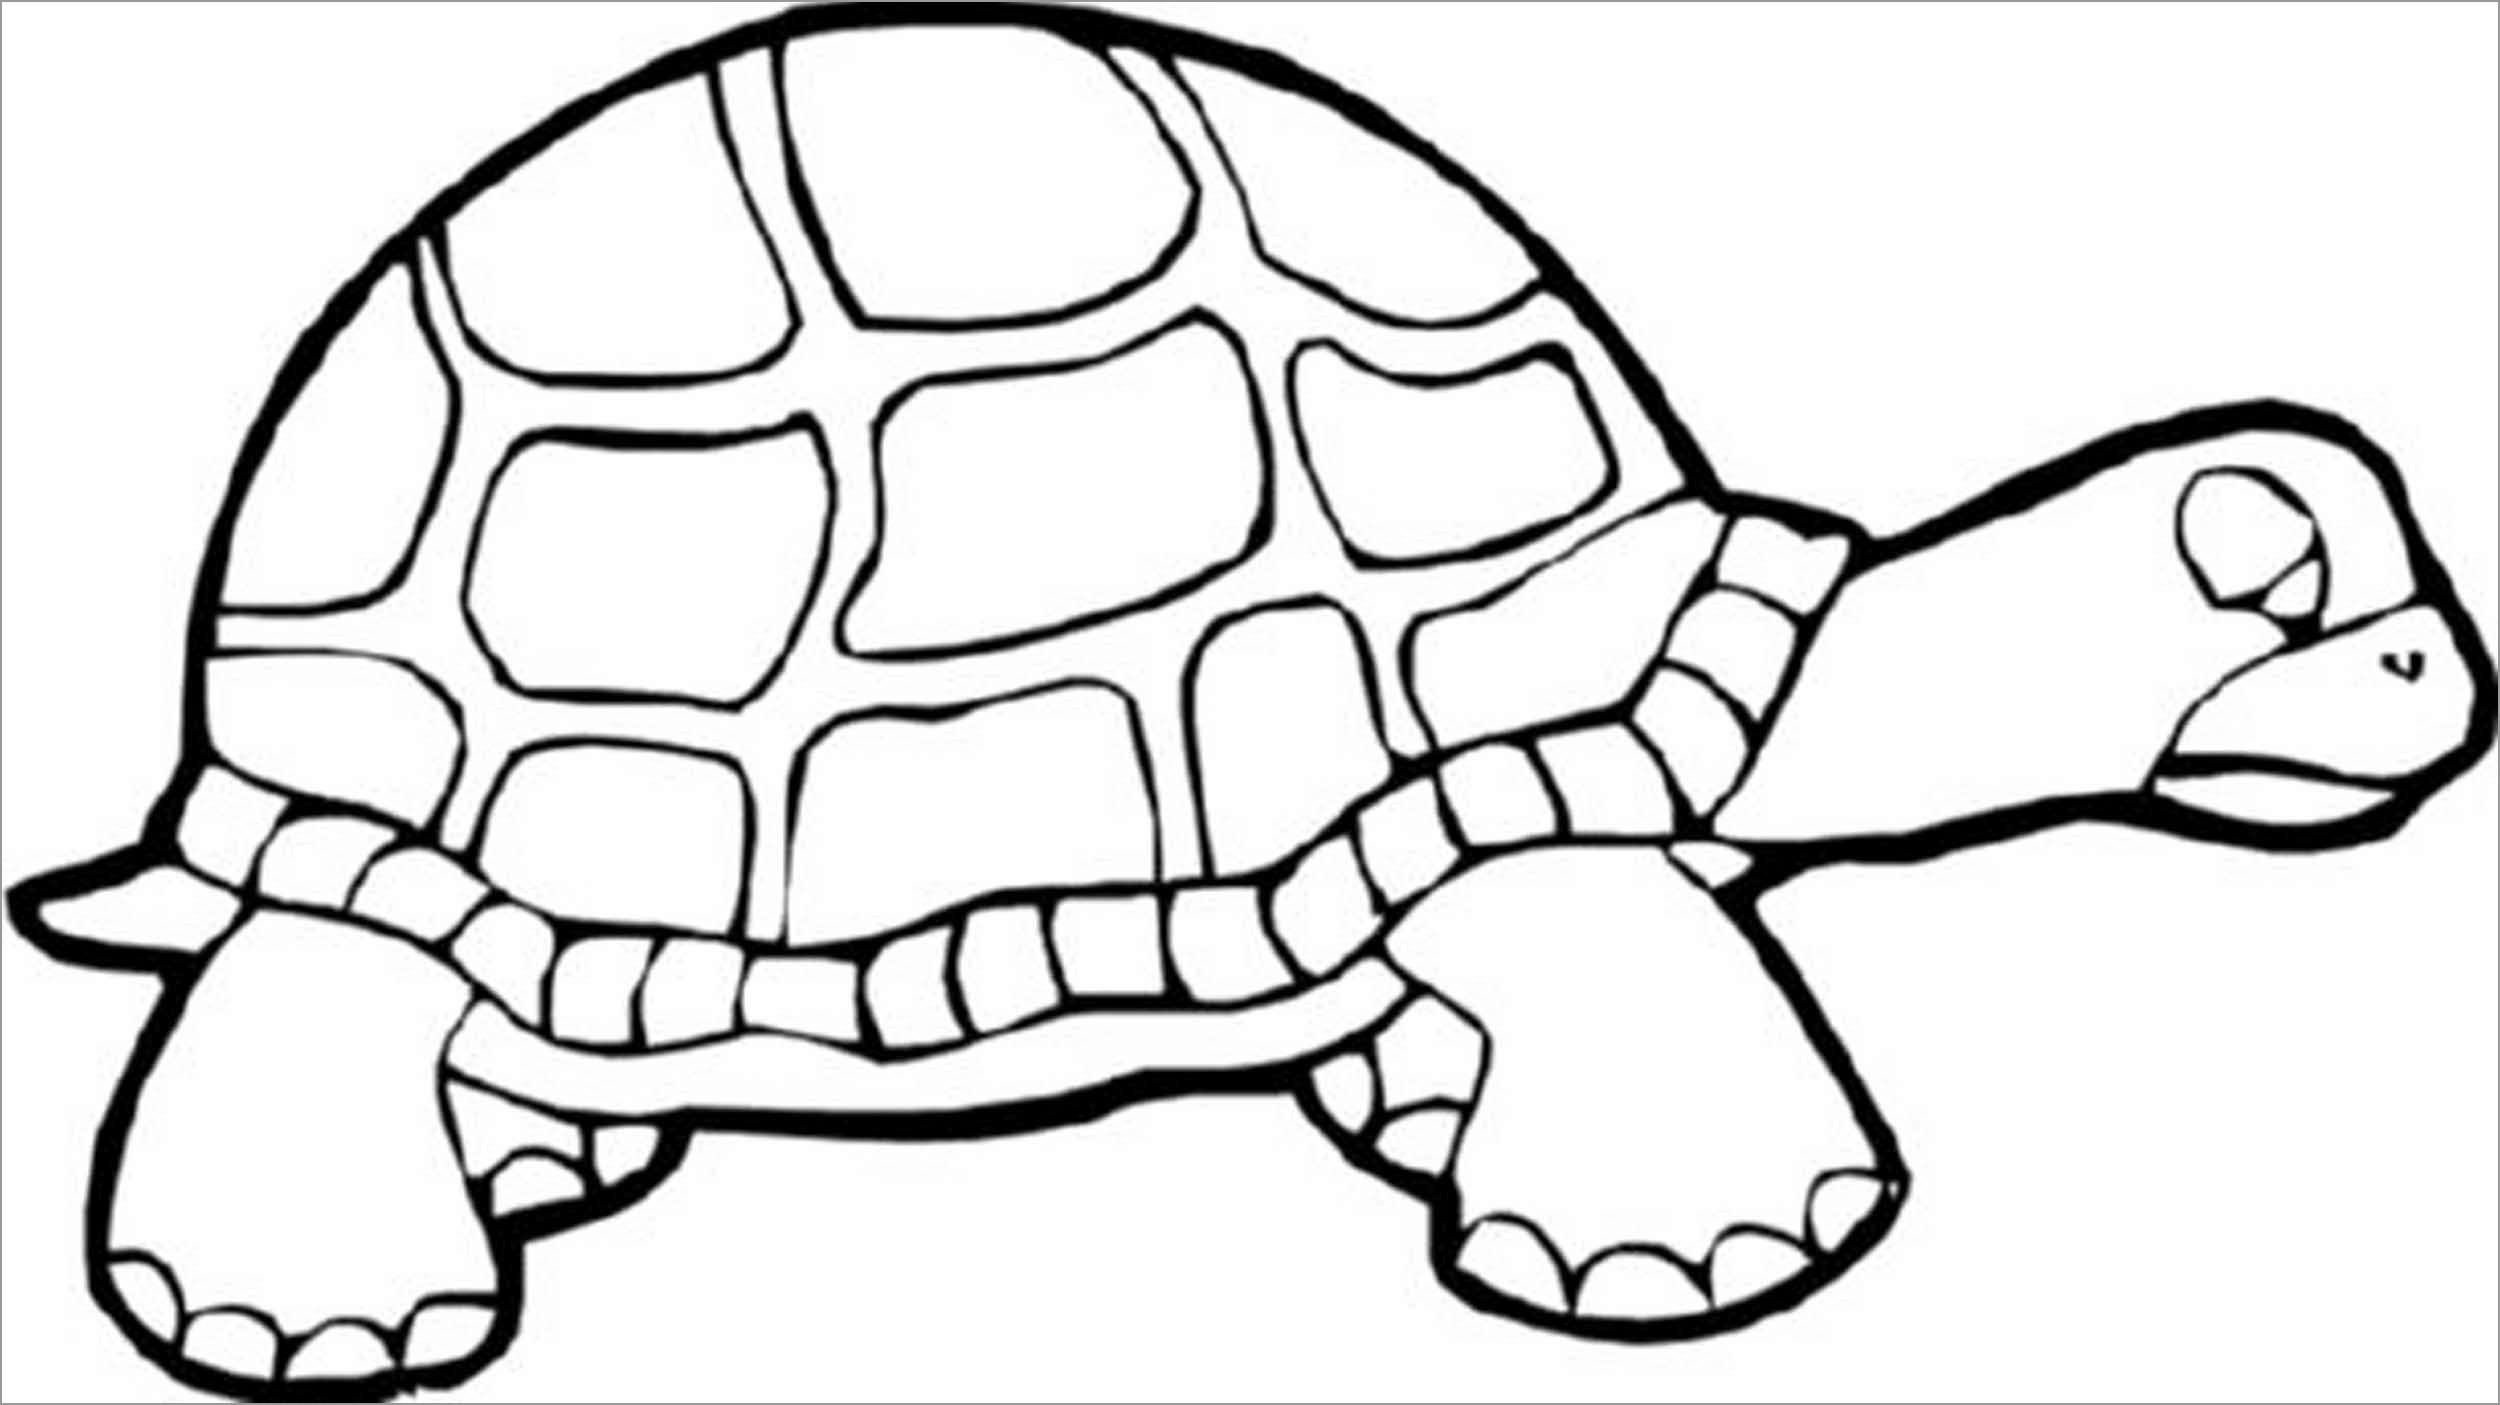 Prek Turtle Coloring Page